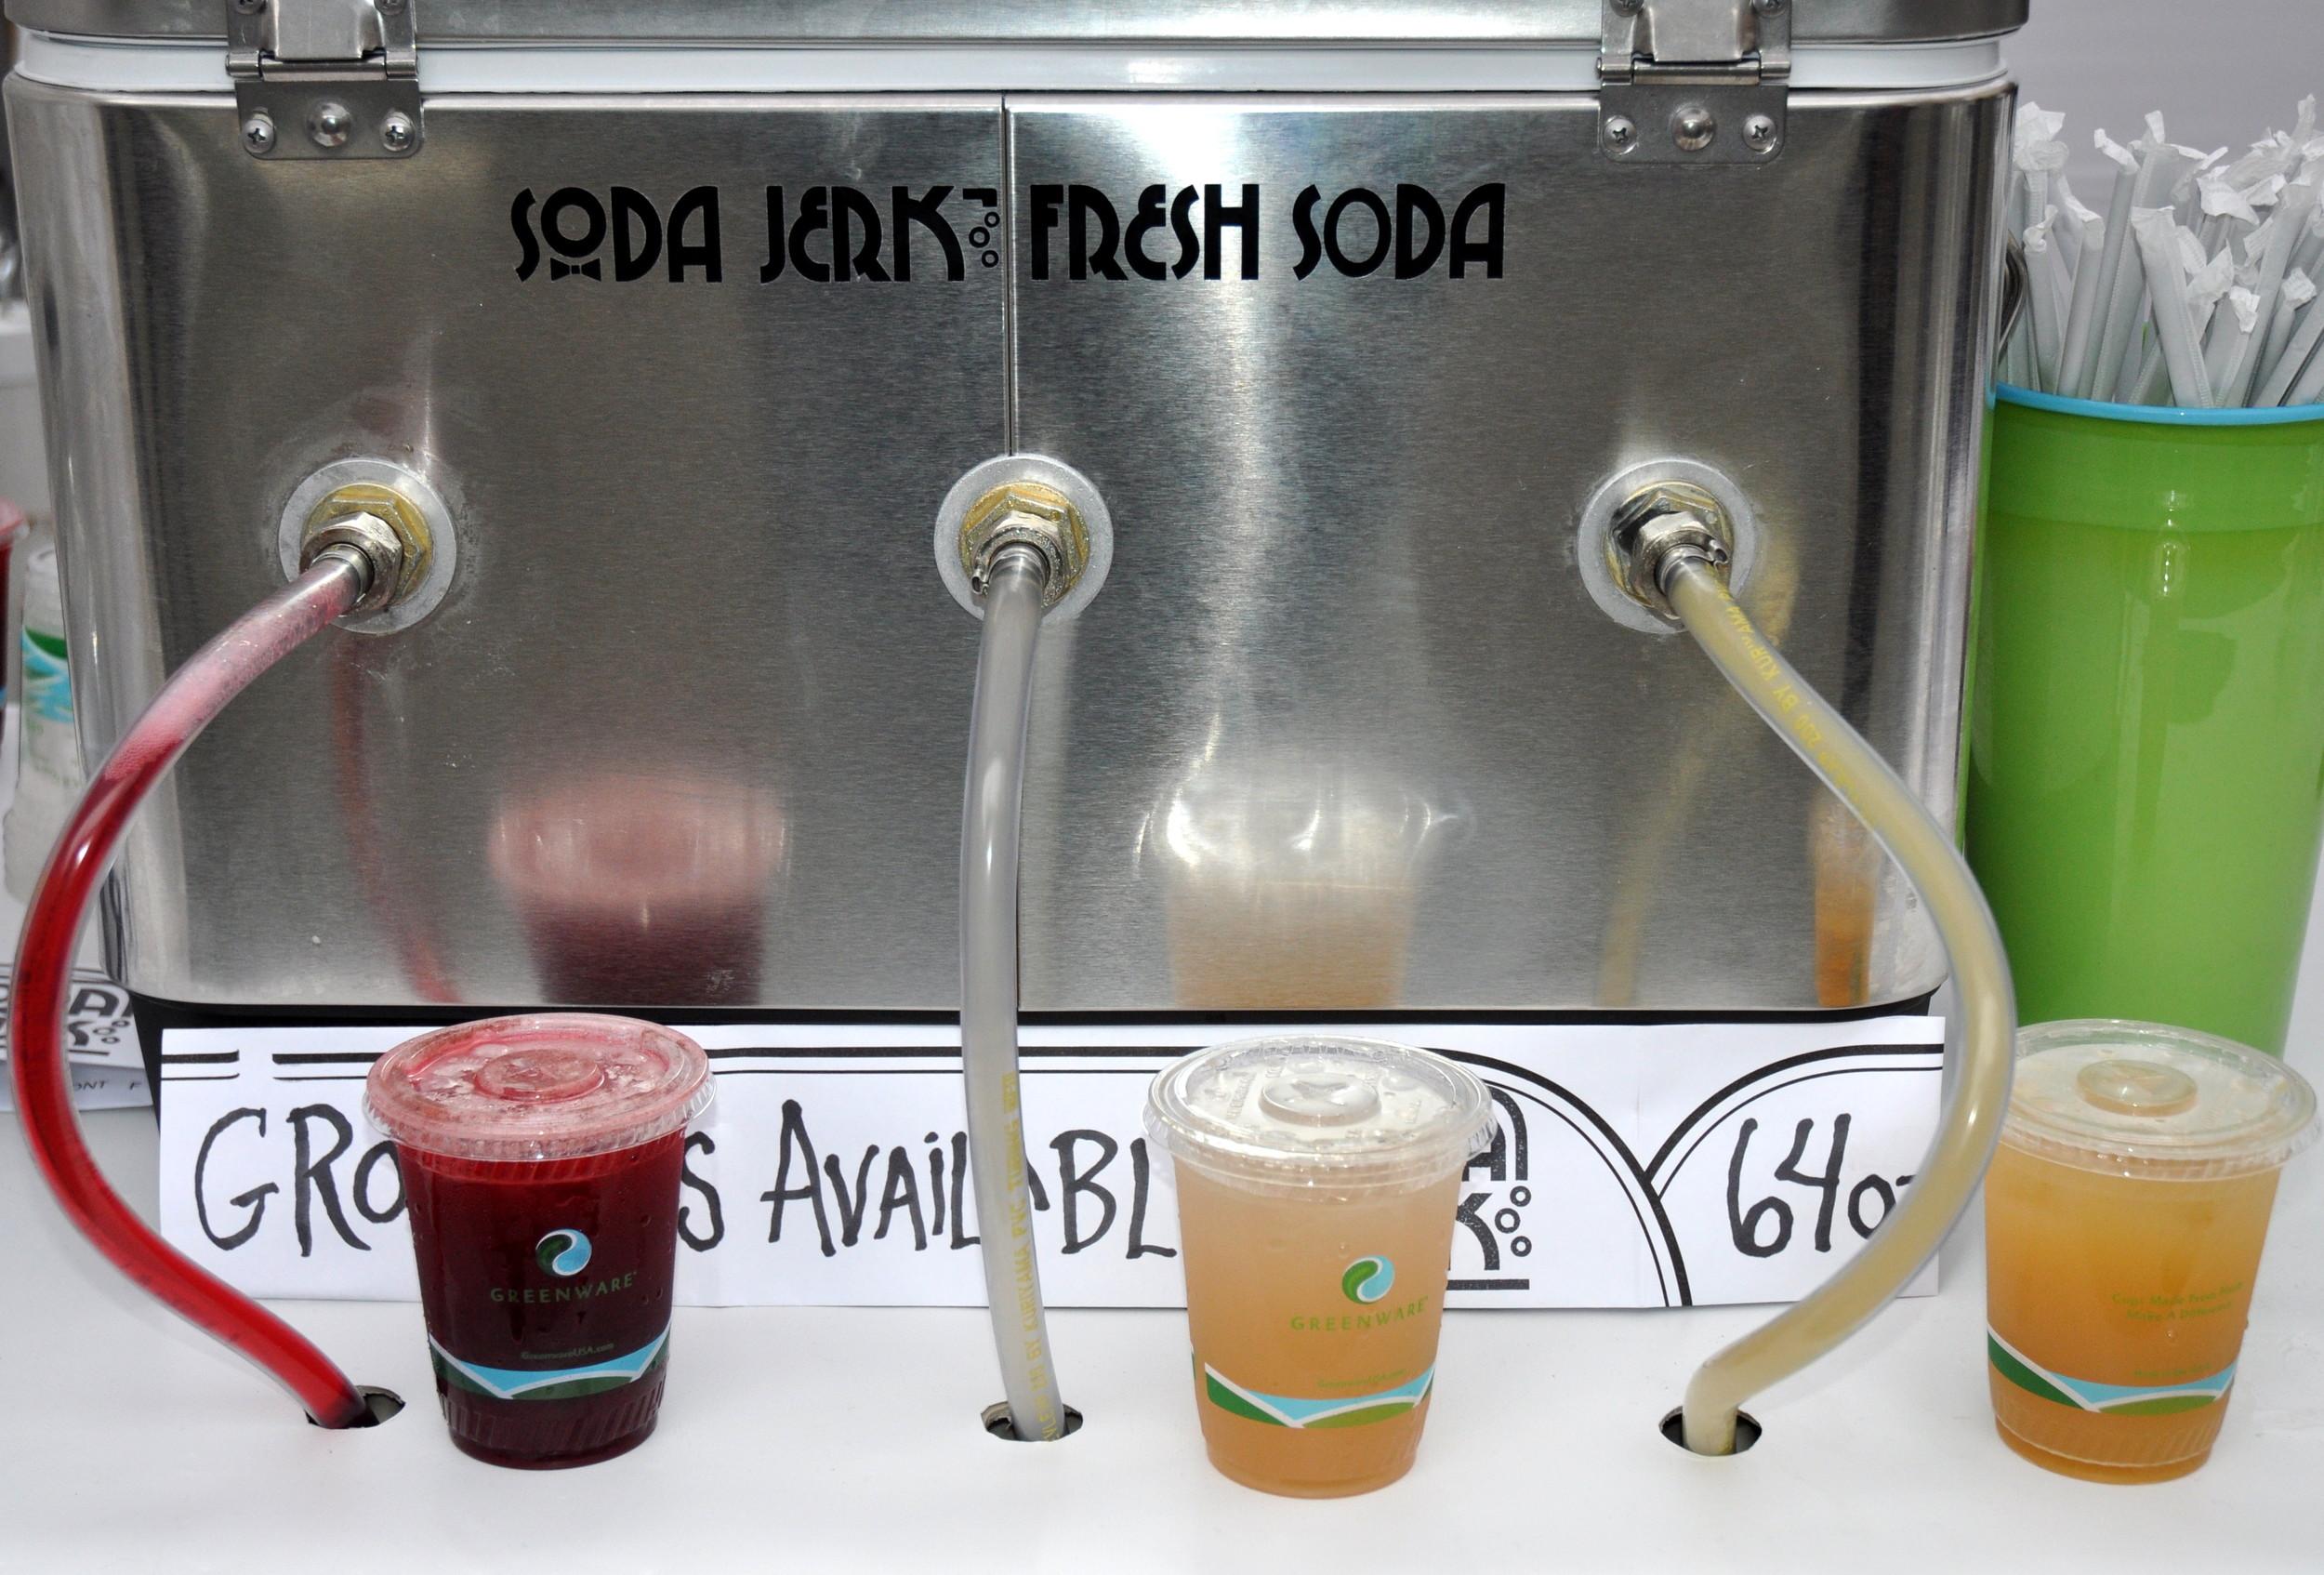 Fresh sodas from Soda Jerk Soda. Photo copyright 2012 by Zachary D. Lyons.